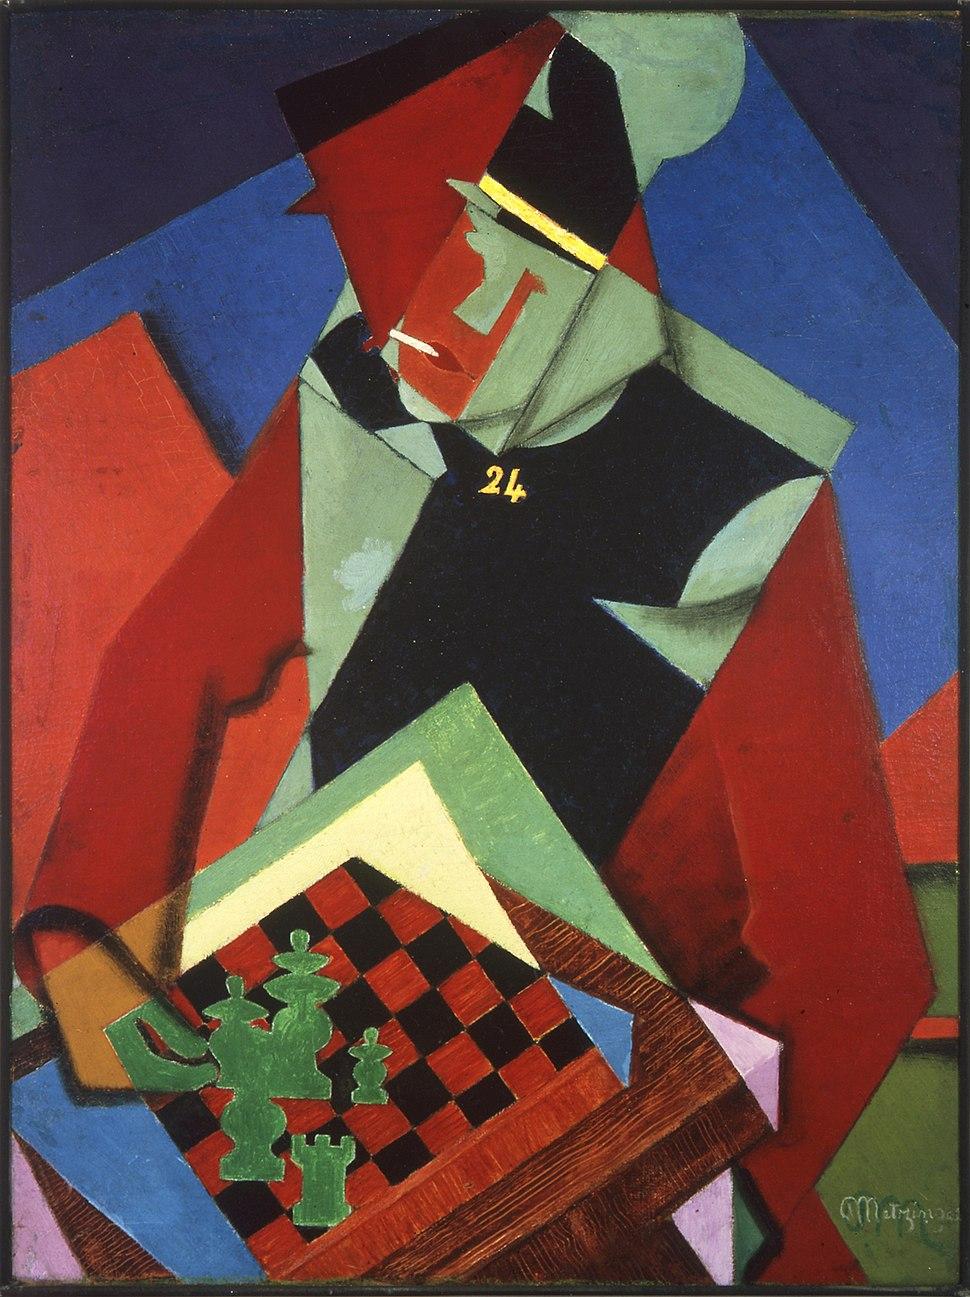 Jean Metzinger, 1915, Soldat jouant aux échecs (Soldier at a Game of Chess), oil on canvas, 81.3 x 61 cm, Smart Museum of Art